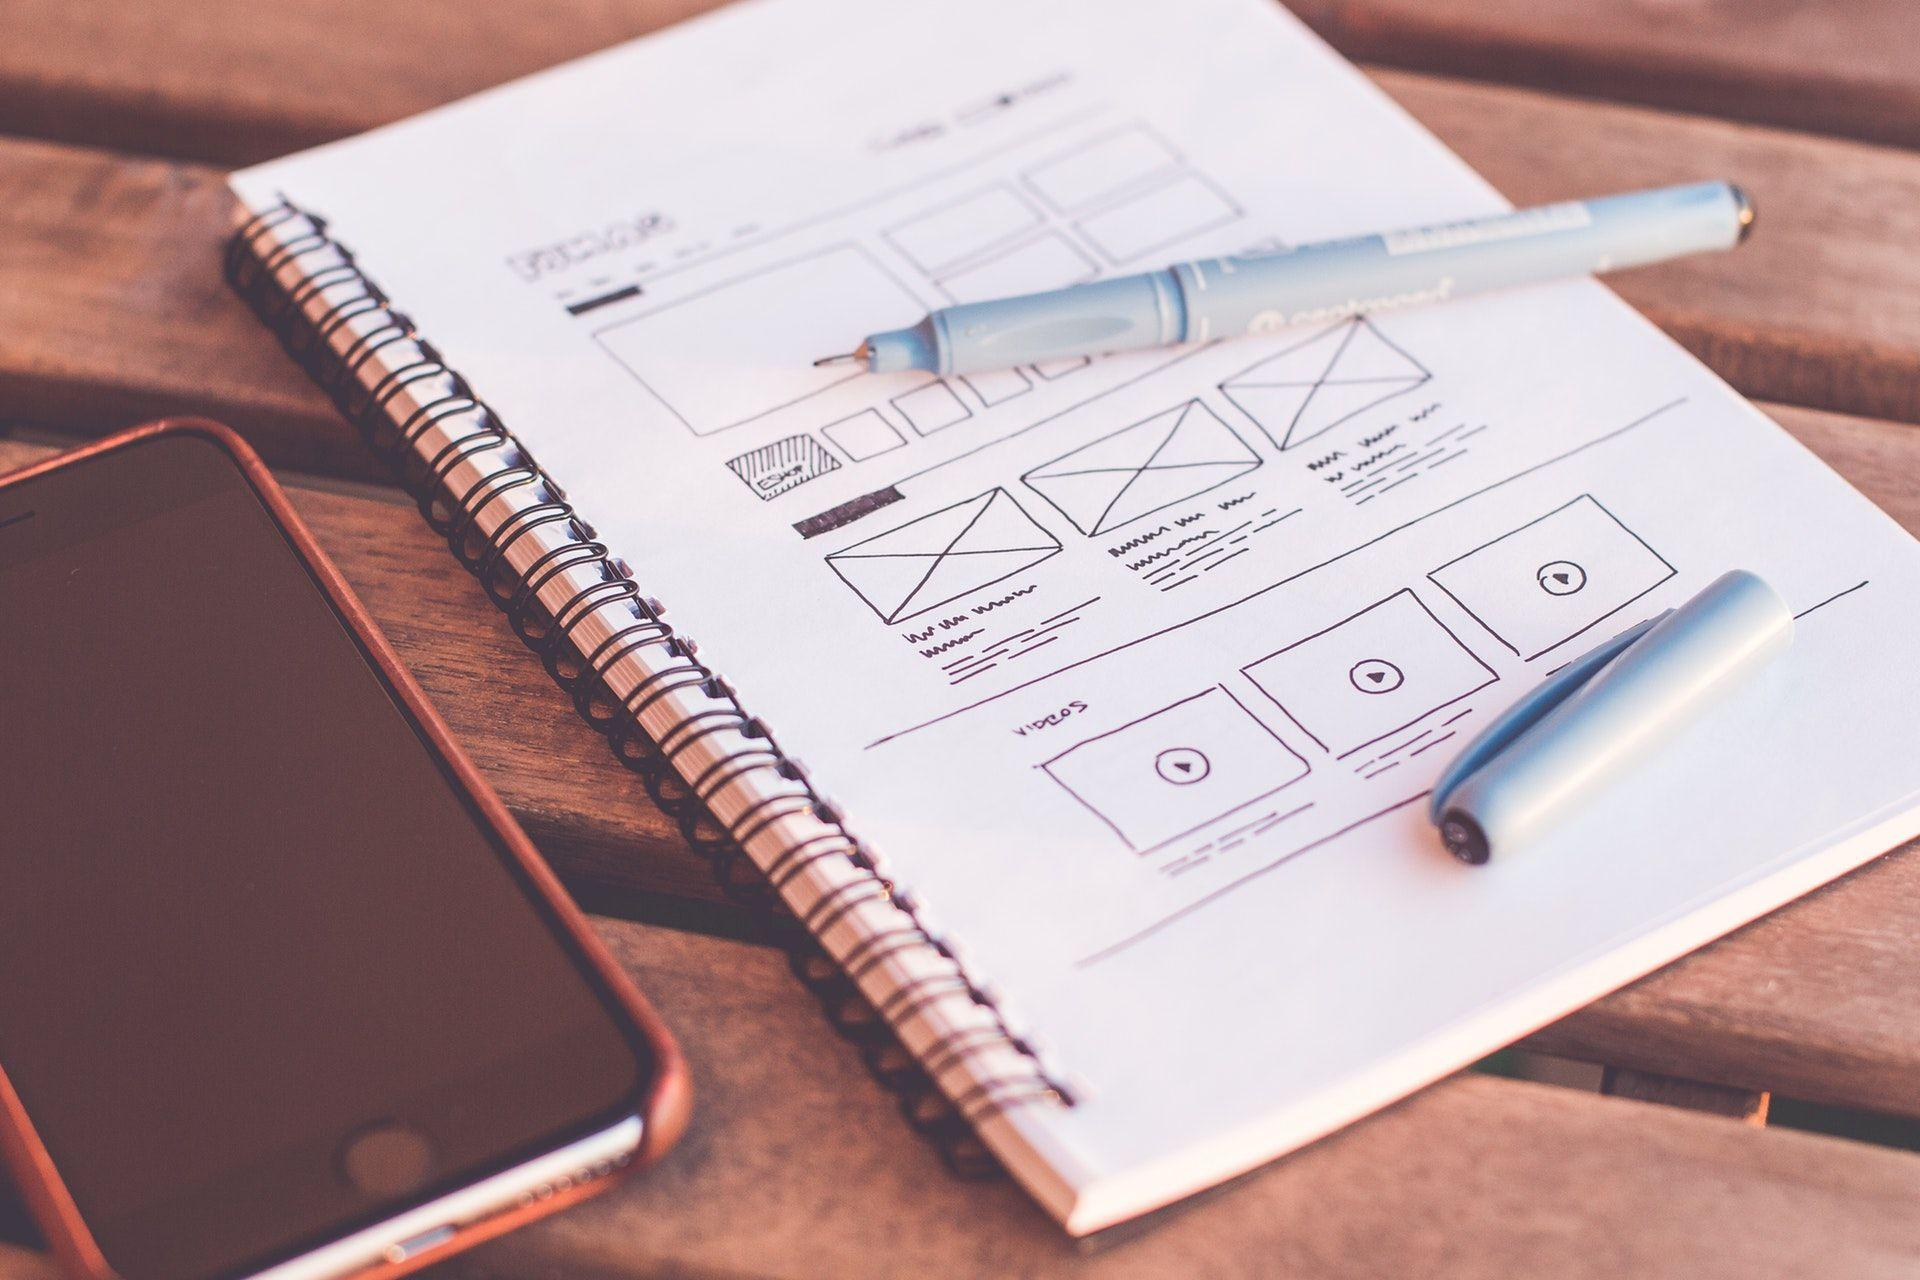 Bild-Webdesign-Wireframe